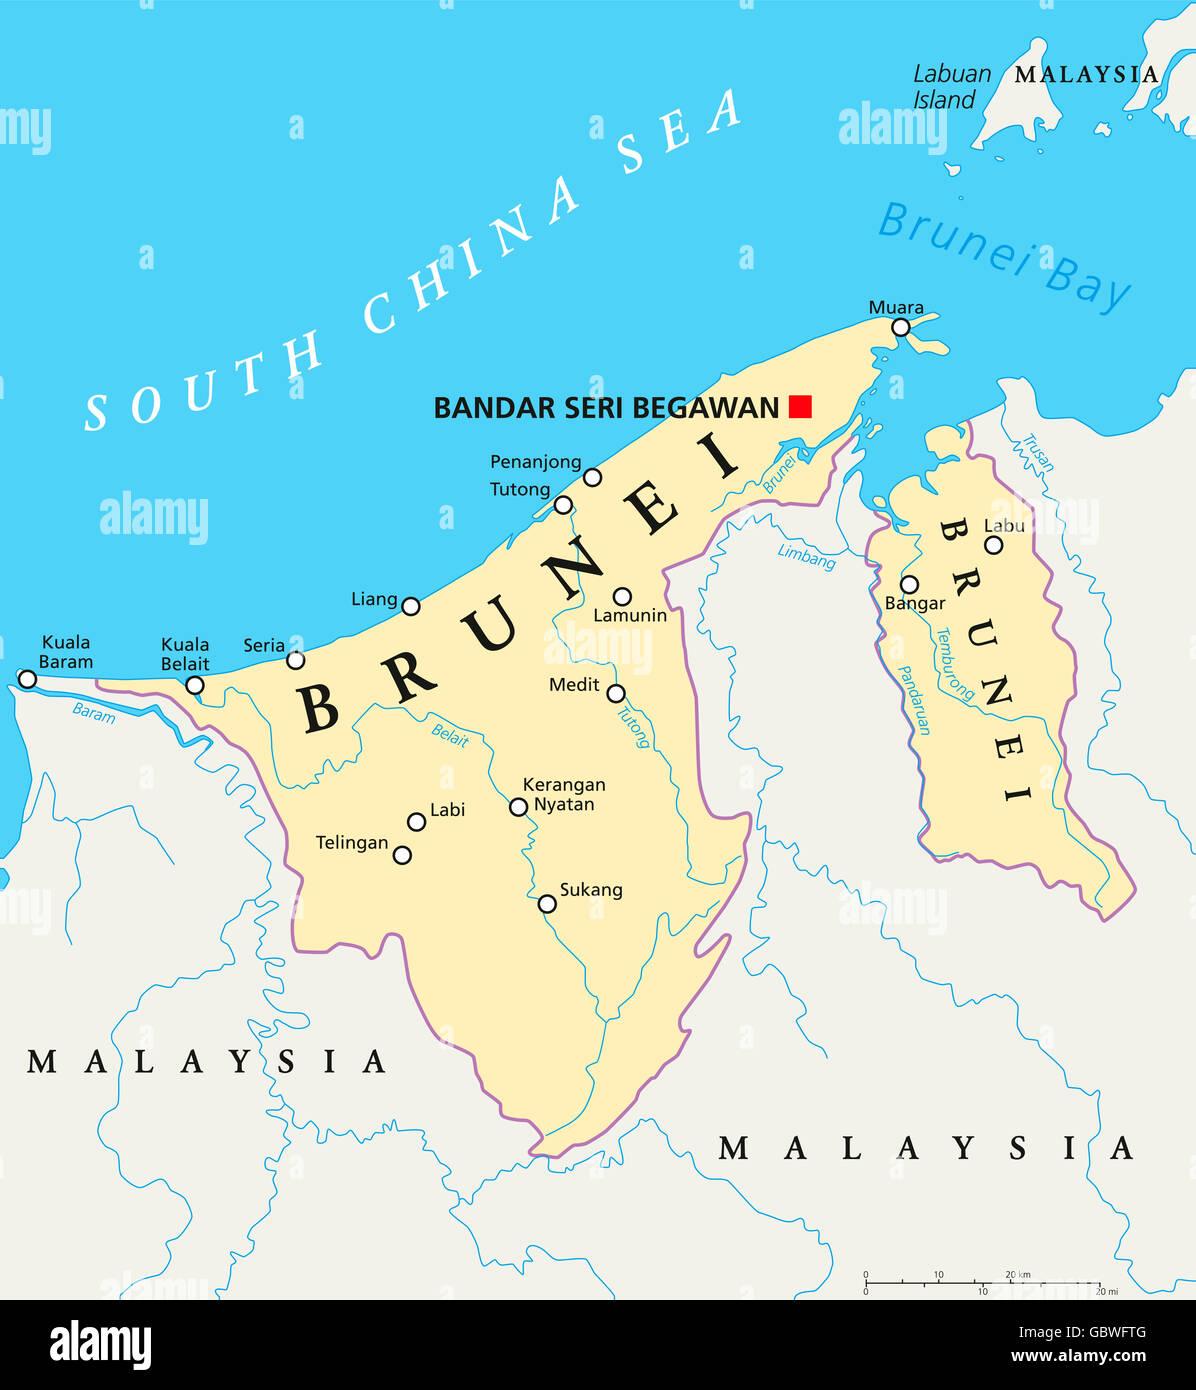 Brunei Politische Karte Mit Hauptstadt Bandar Seri Begawan Landergrenzen Stadte Und Flusse Stockfotografie Alamy